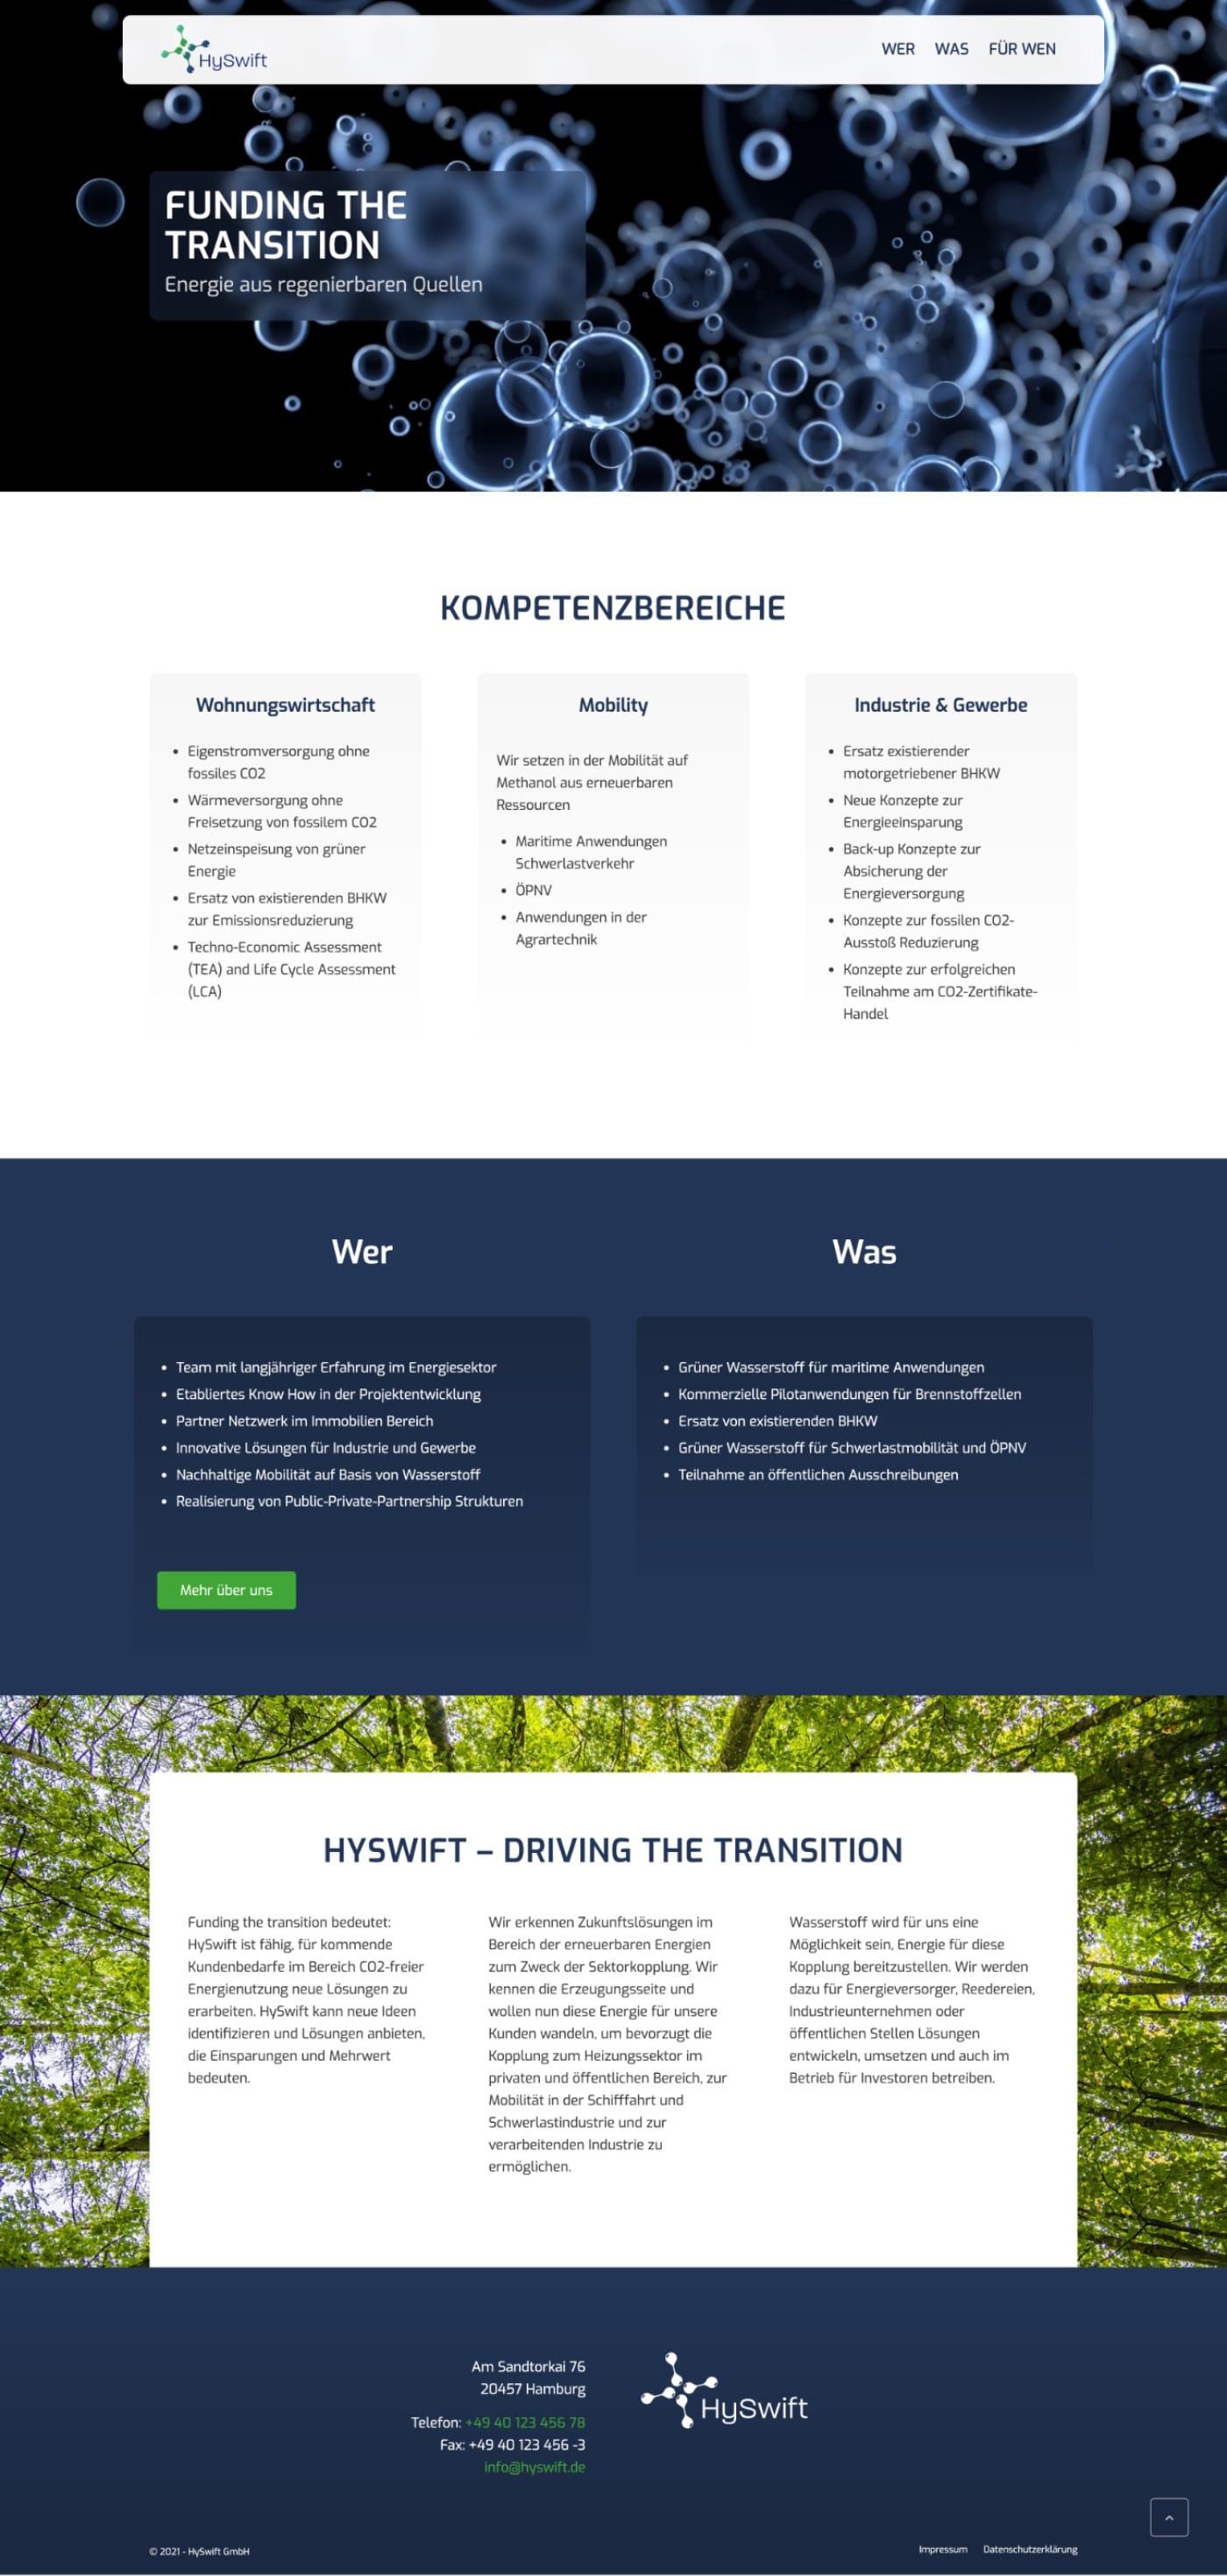 HySwift-GmbH - Website